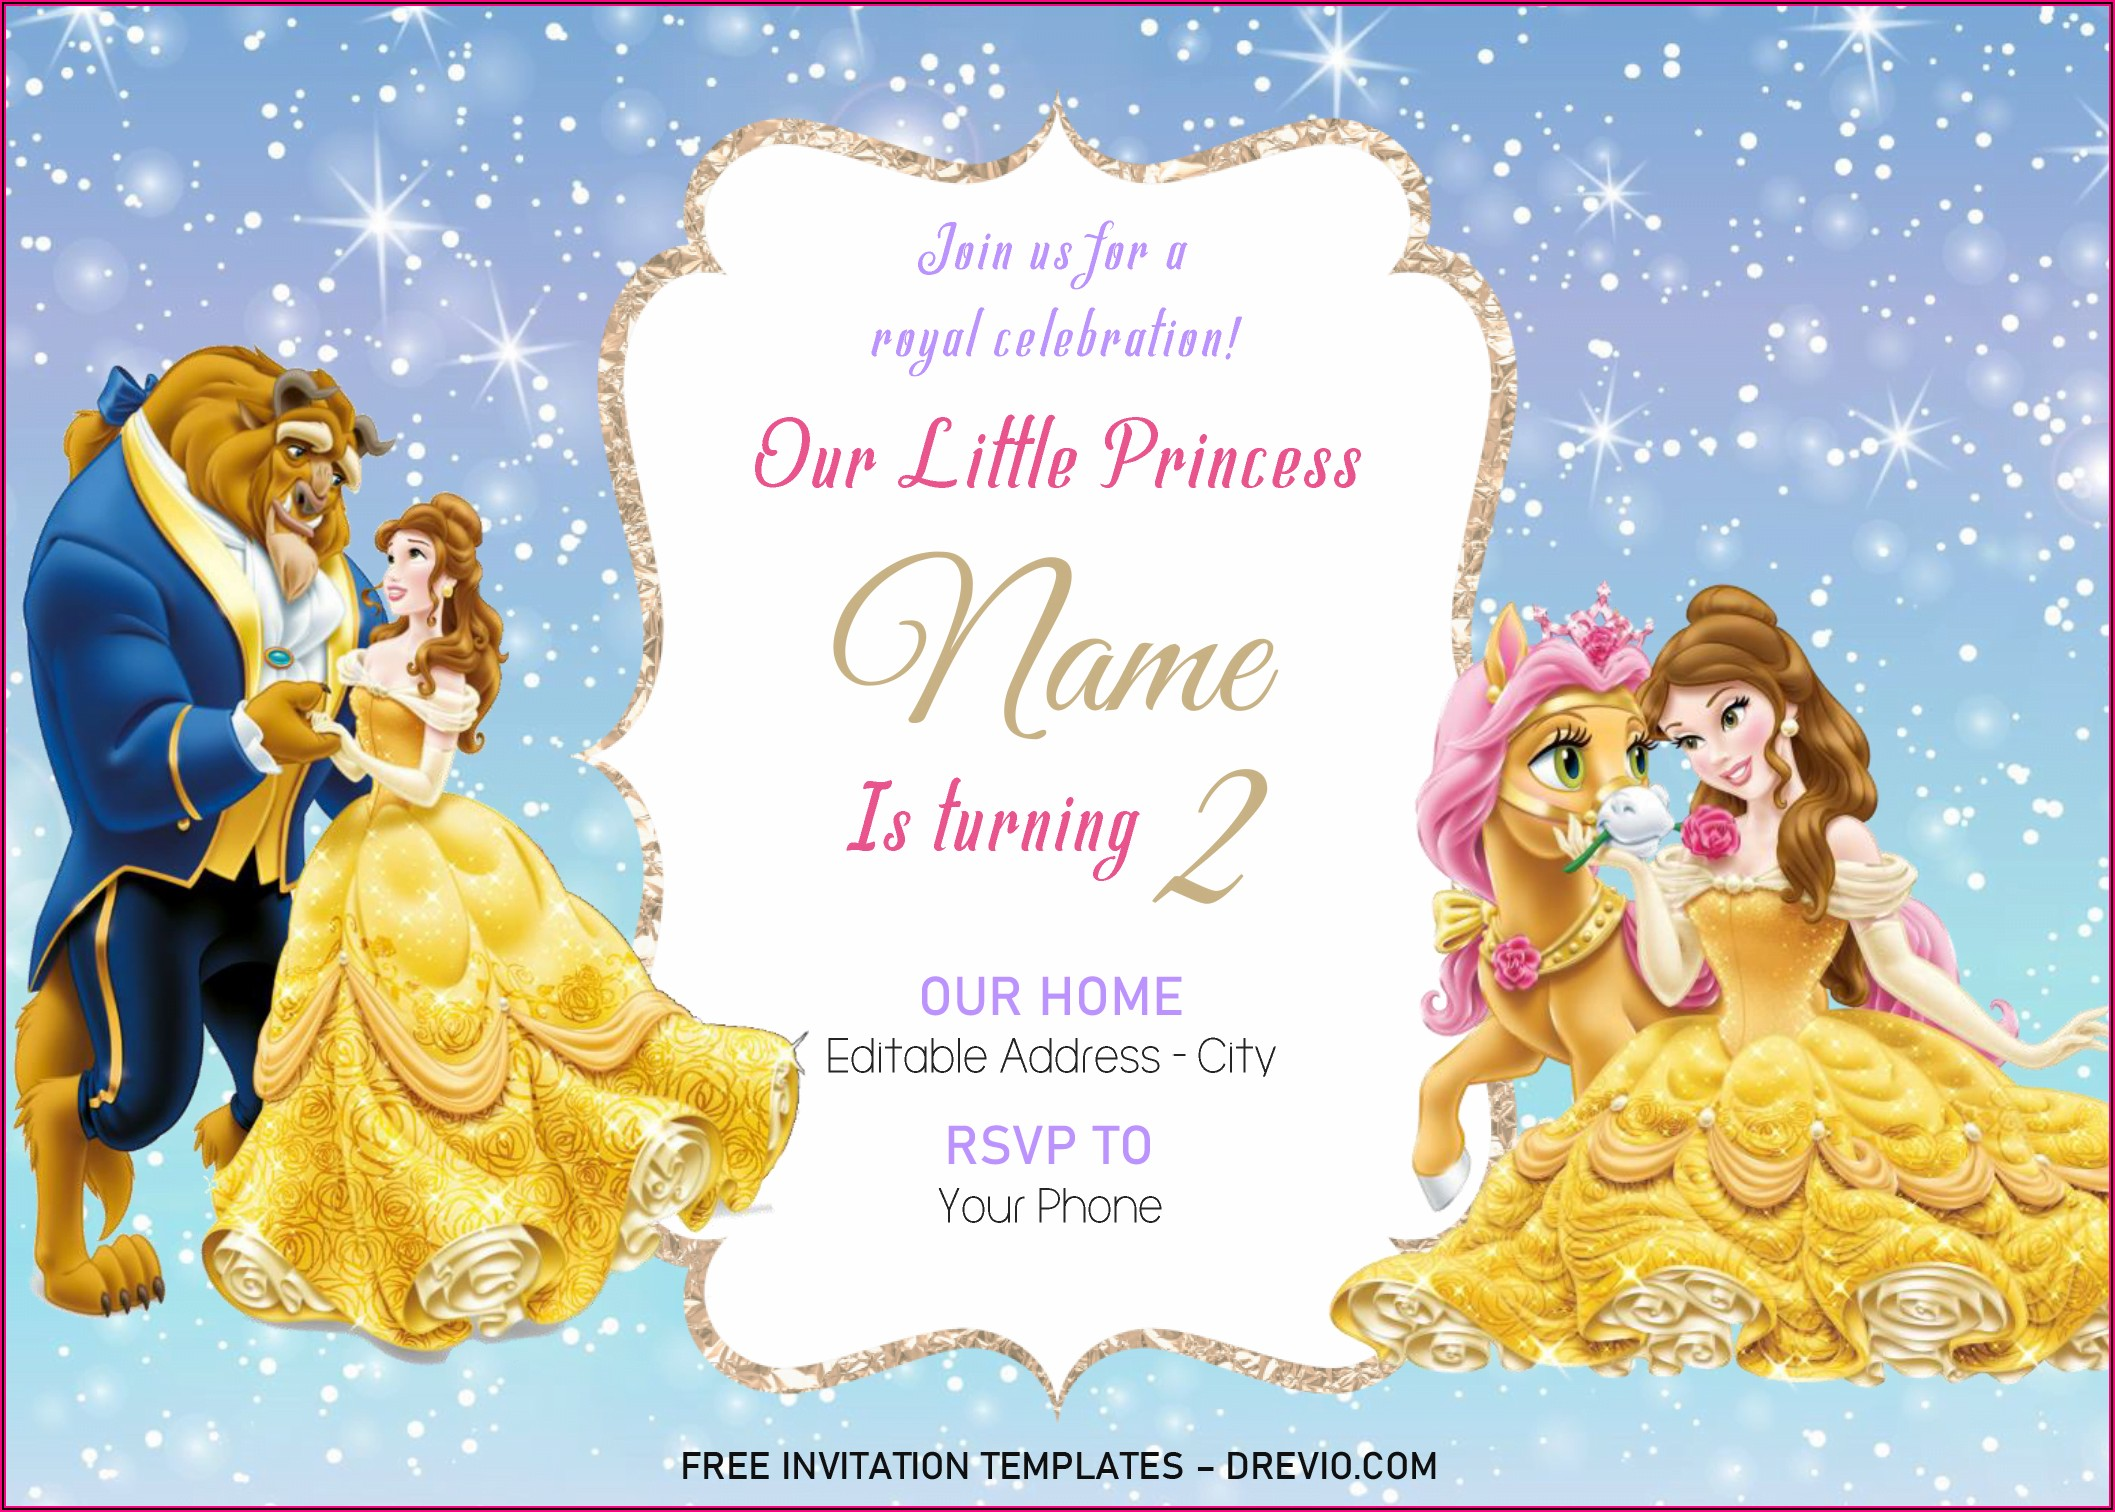 Editable Downloadable Disney Princess Invitation Template